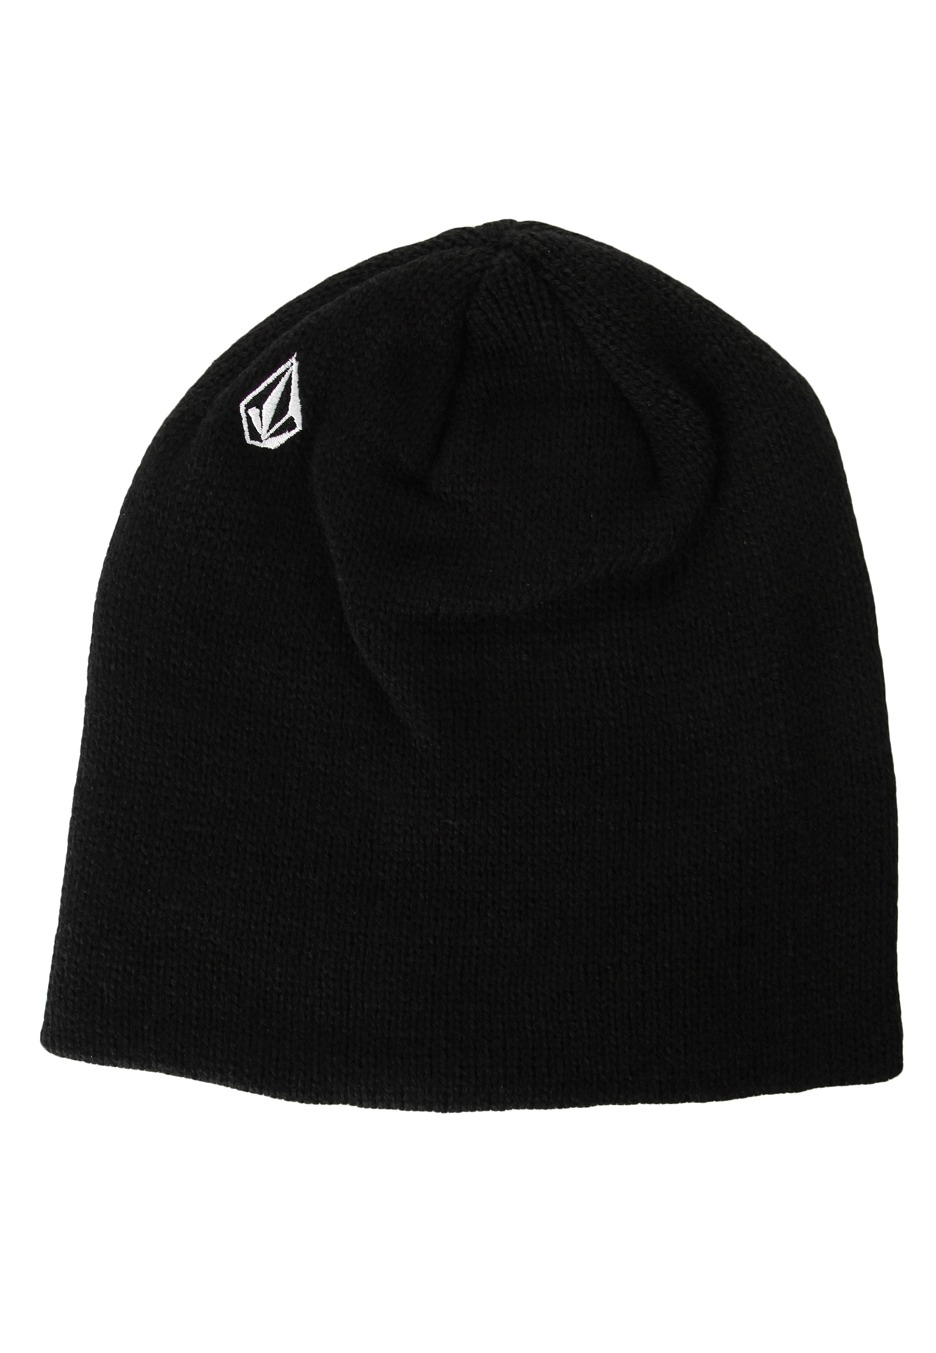 Volcom - Woolcott - Beanie - Streetwear Shop - Impericon.com UK 40ab3a4fbc2